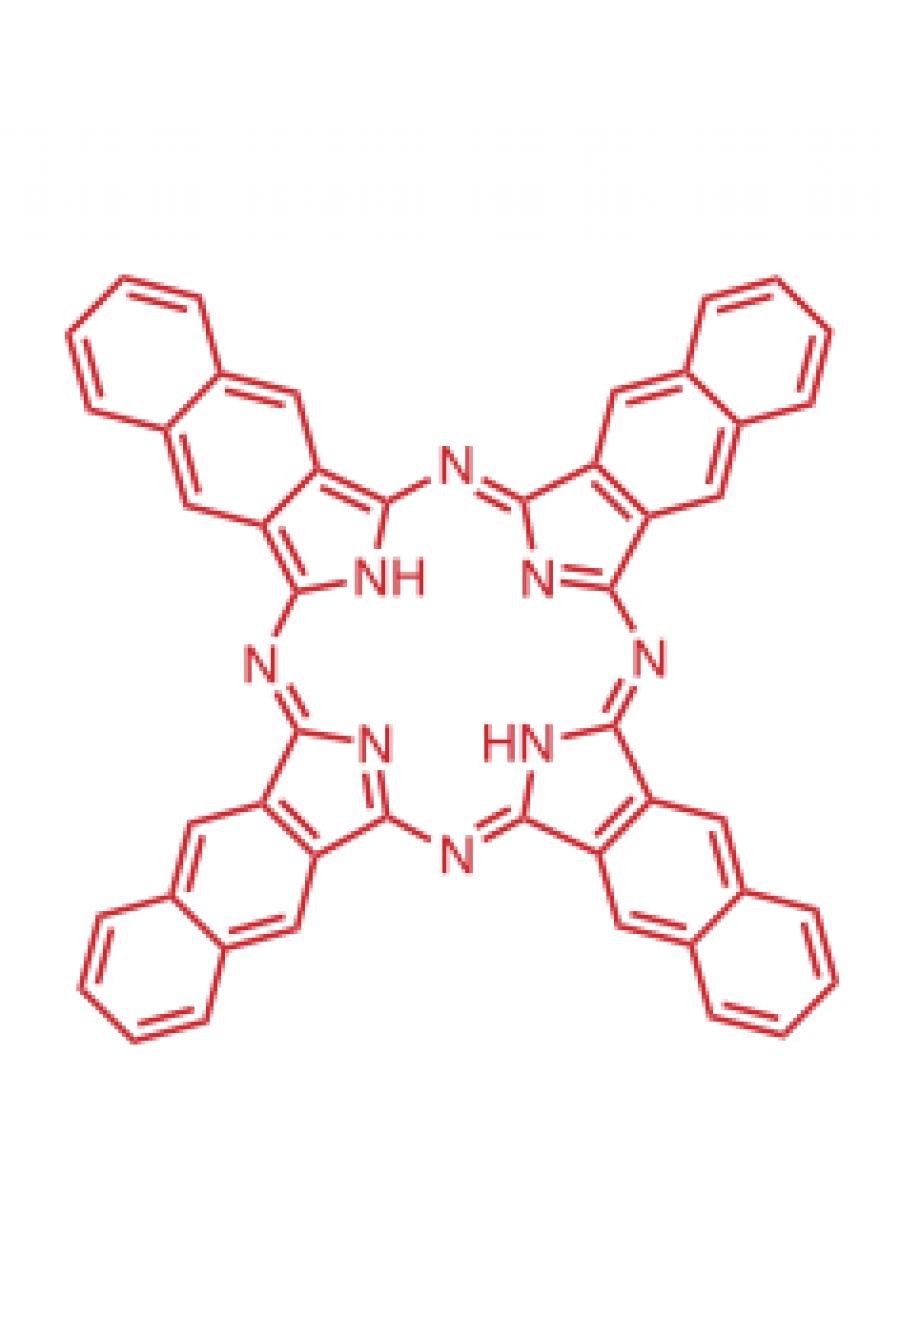 2,3-naphthalocyanine